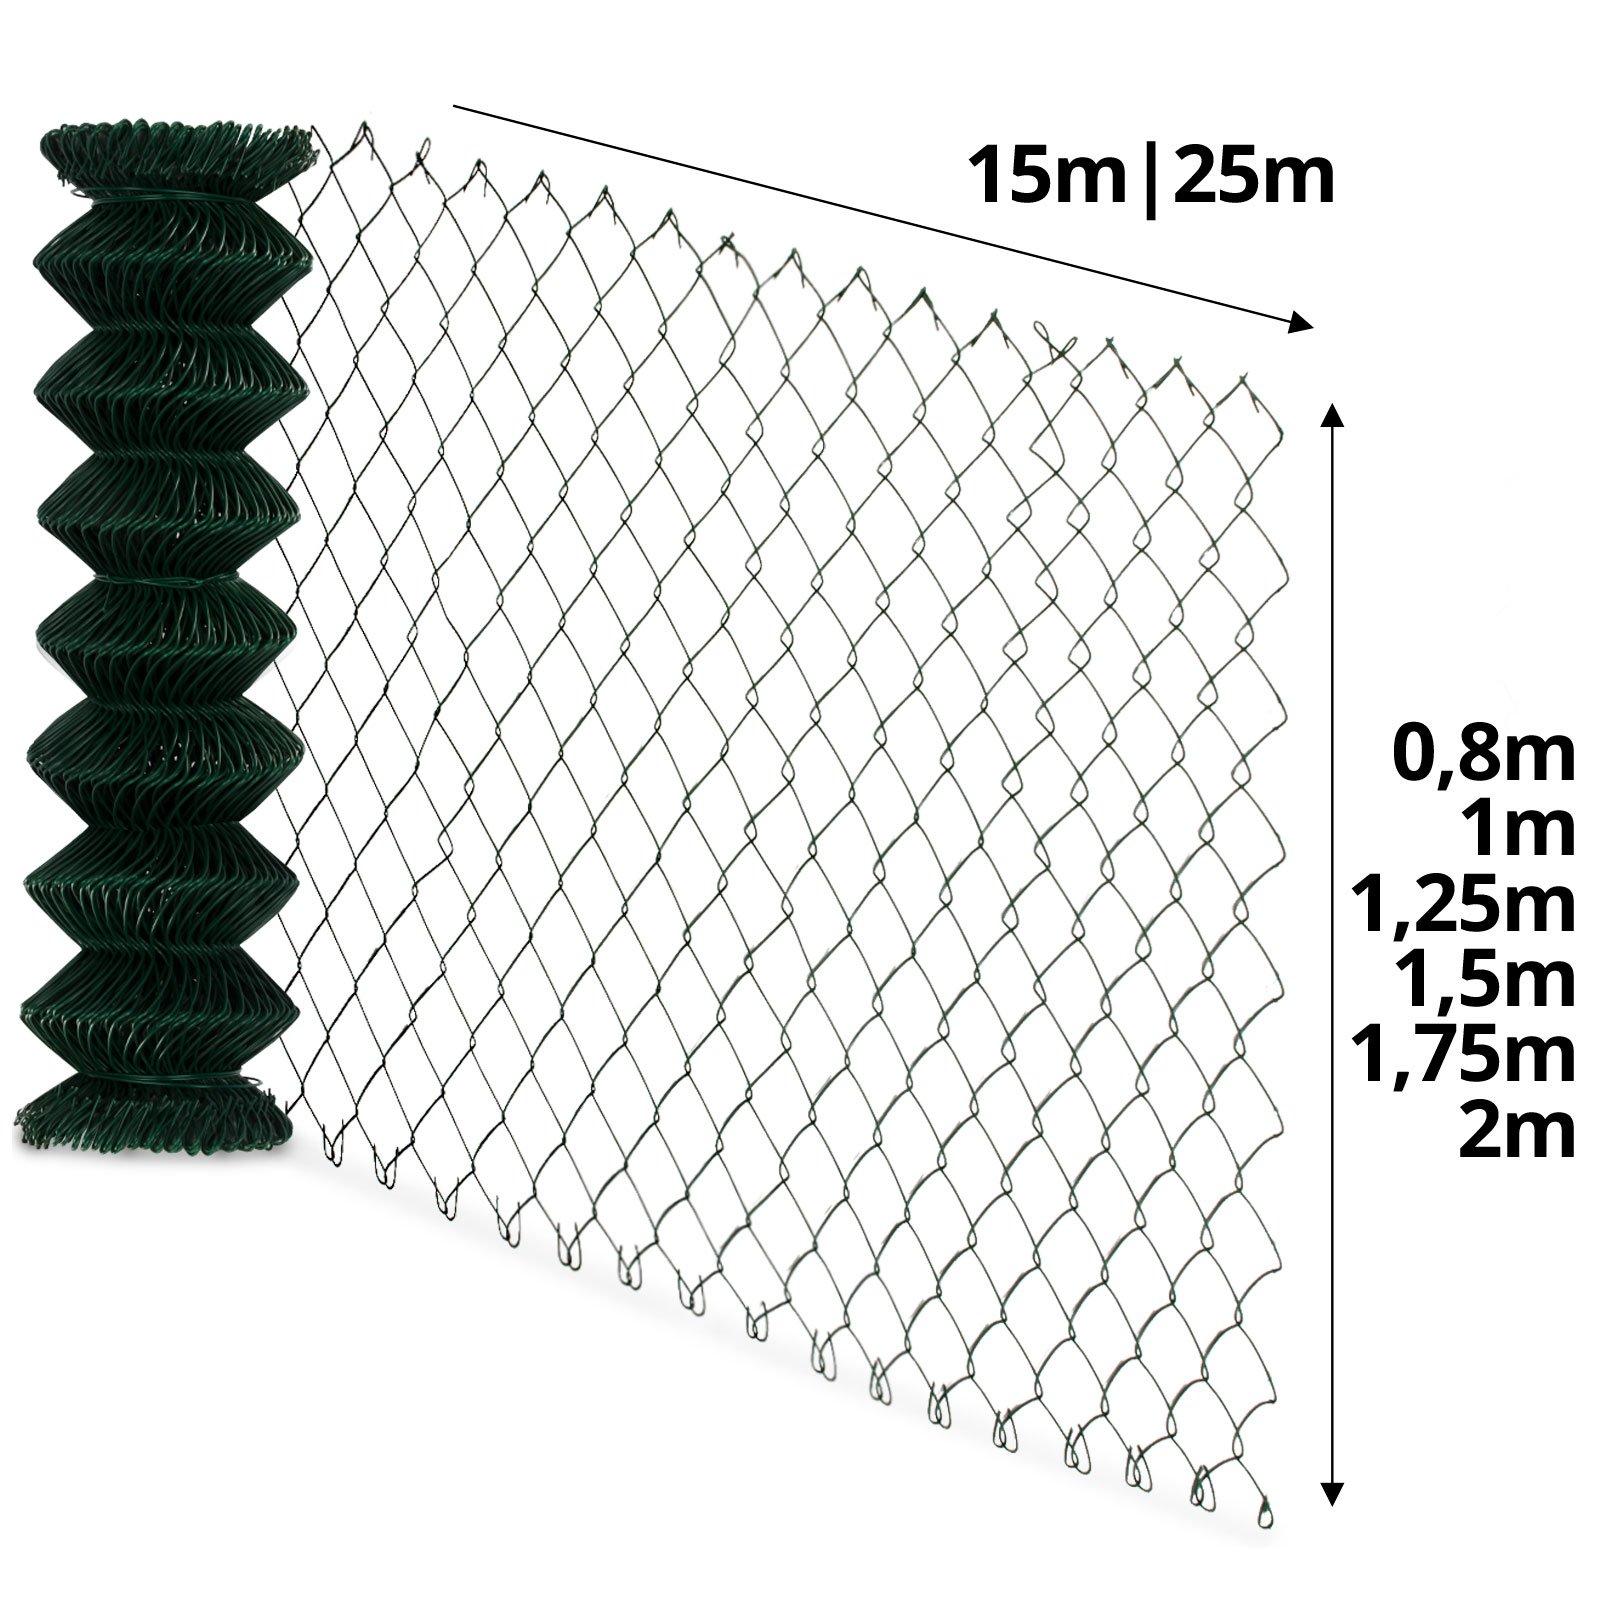 Casa Pura Maschendraht-Geflecht, grün,Maschenweite 60 x 60 mm, Drahtstärke 2,8 mm (80 cm x 15 m)